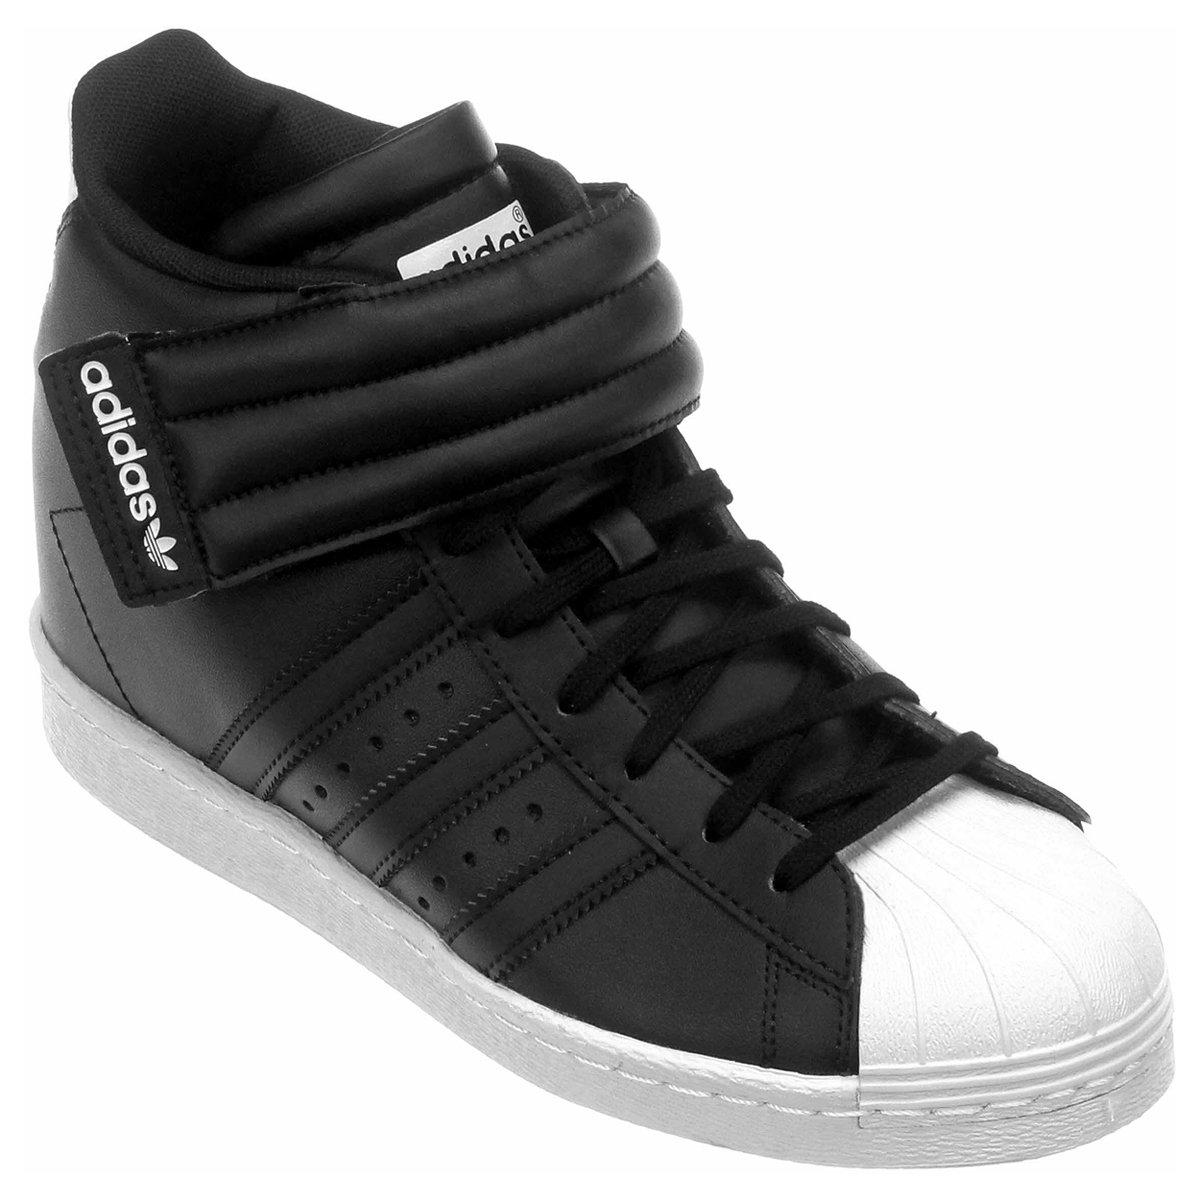 ab2b0975a0552 ... switzerland tênis adidas superstar up strap w preto 2d5d9 18c91